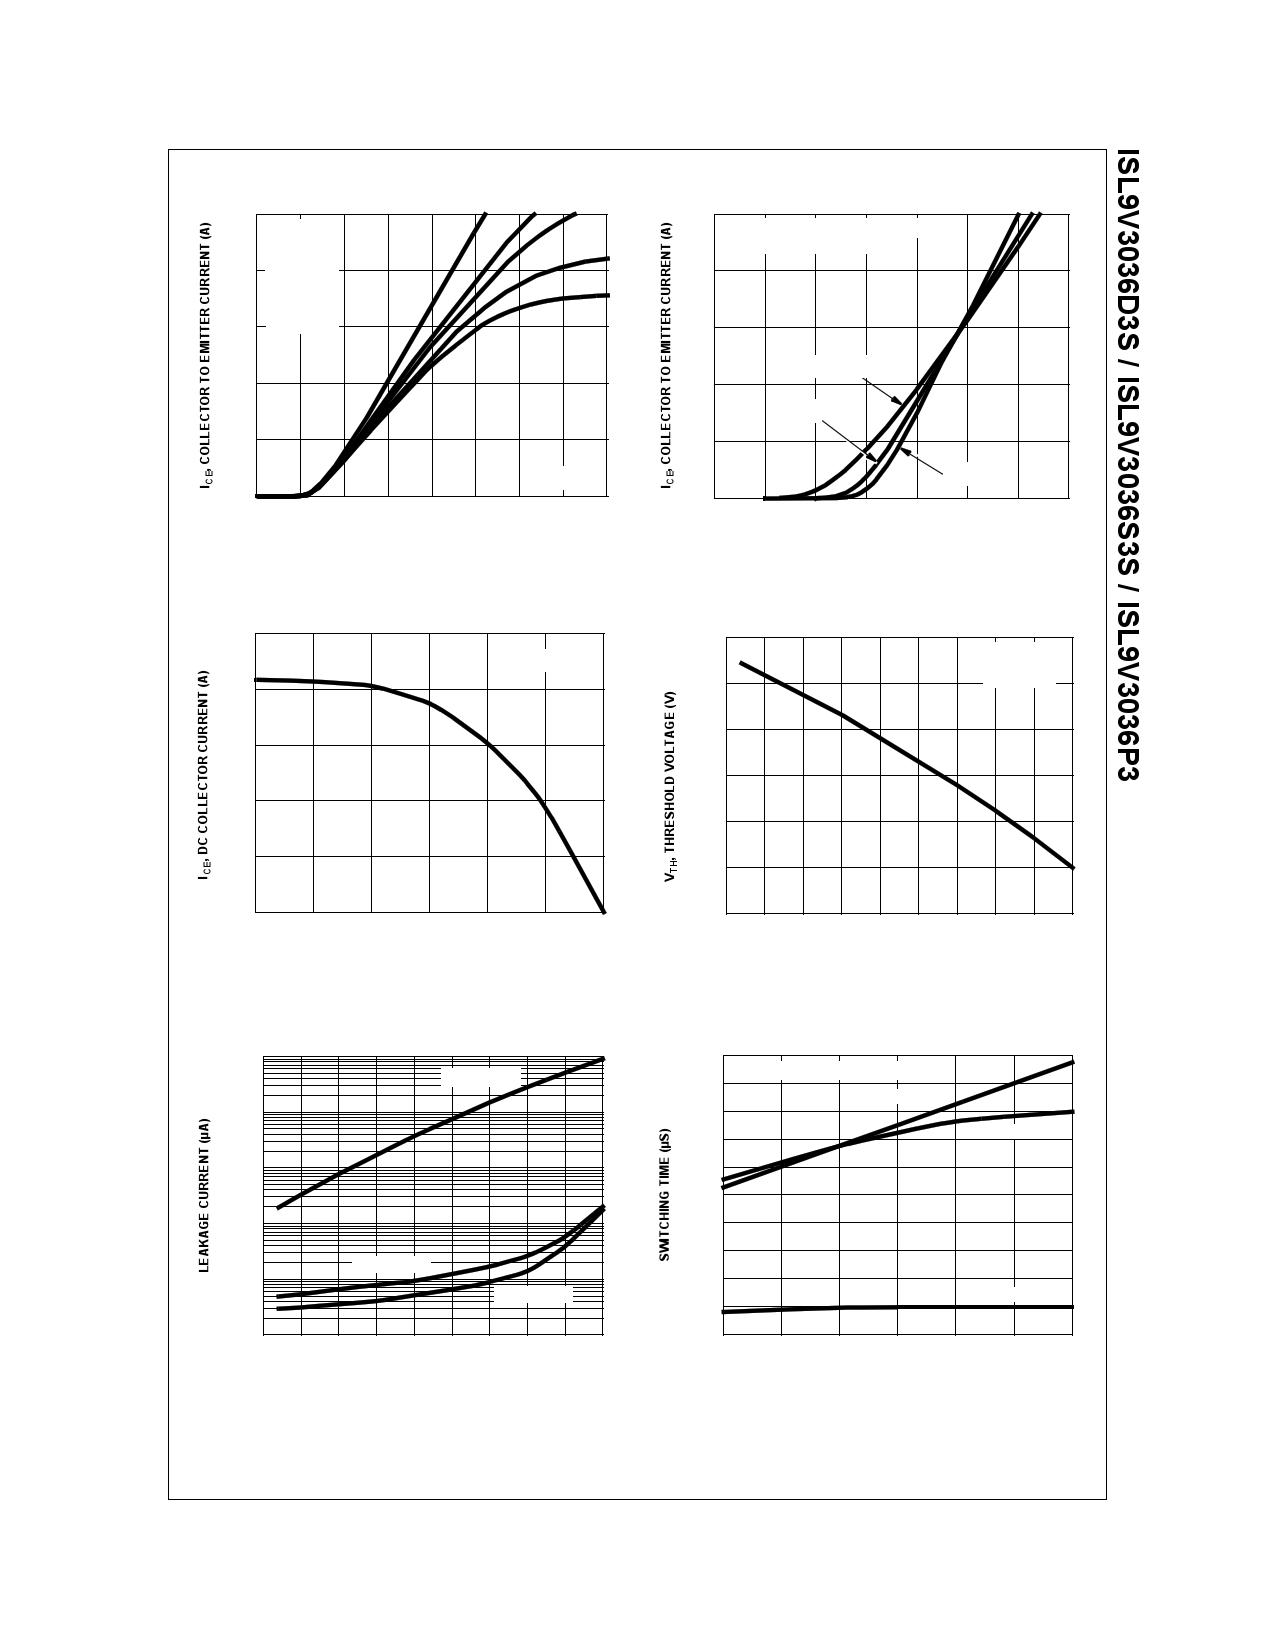 ISL9V3036P3 pdf, 반도체, 판매, 대치품